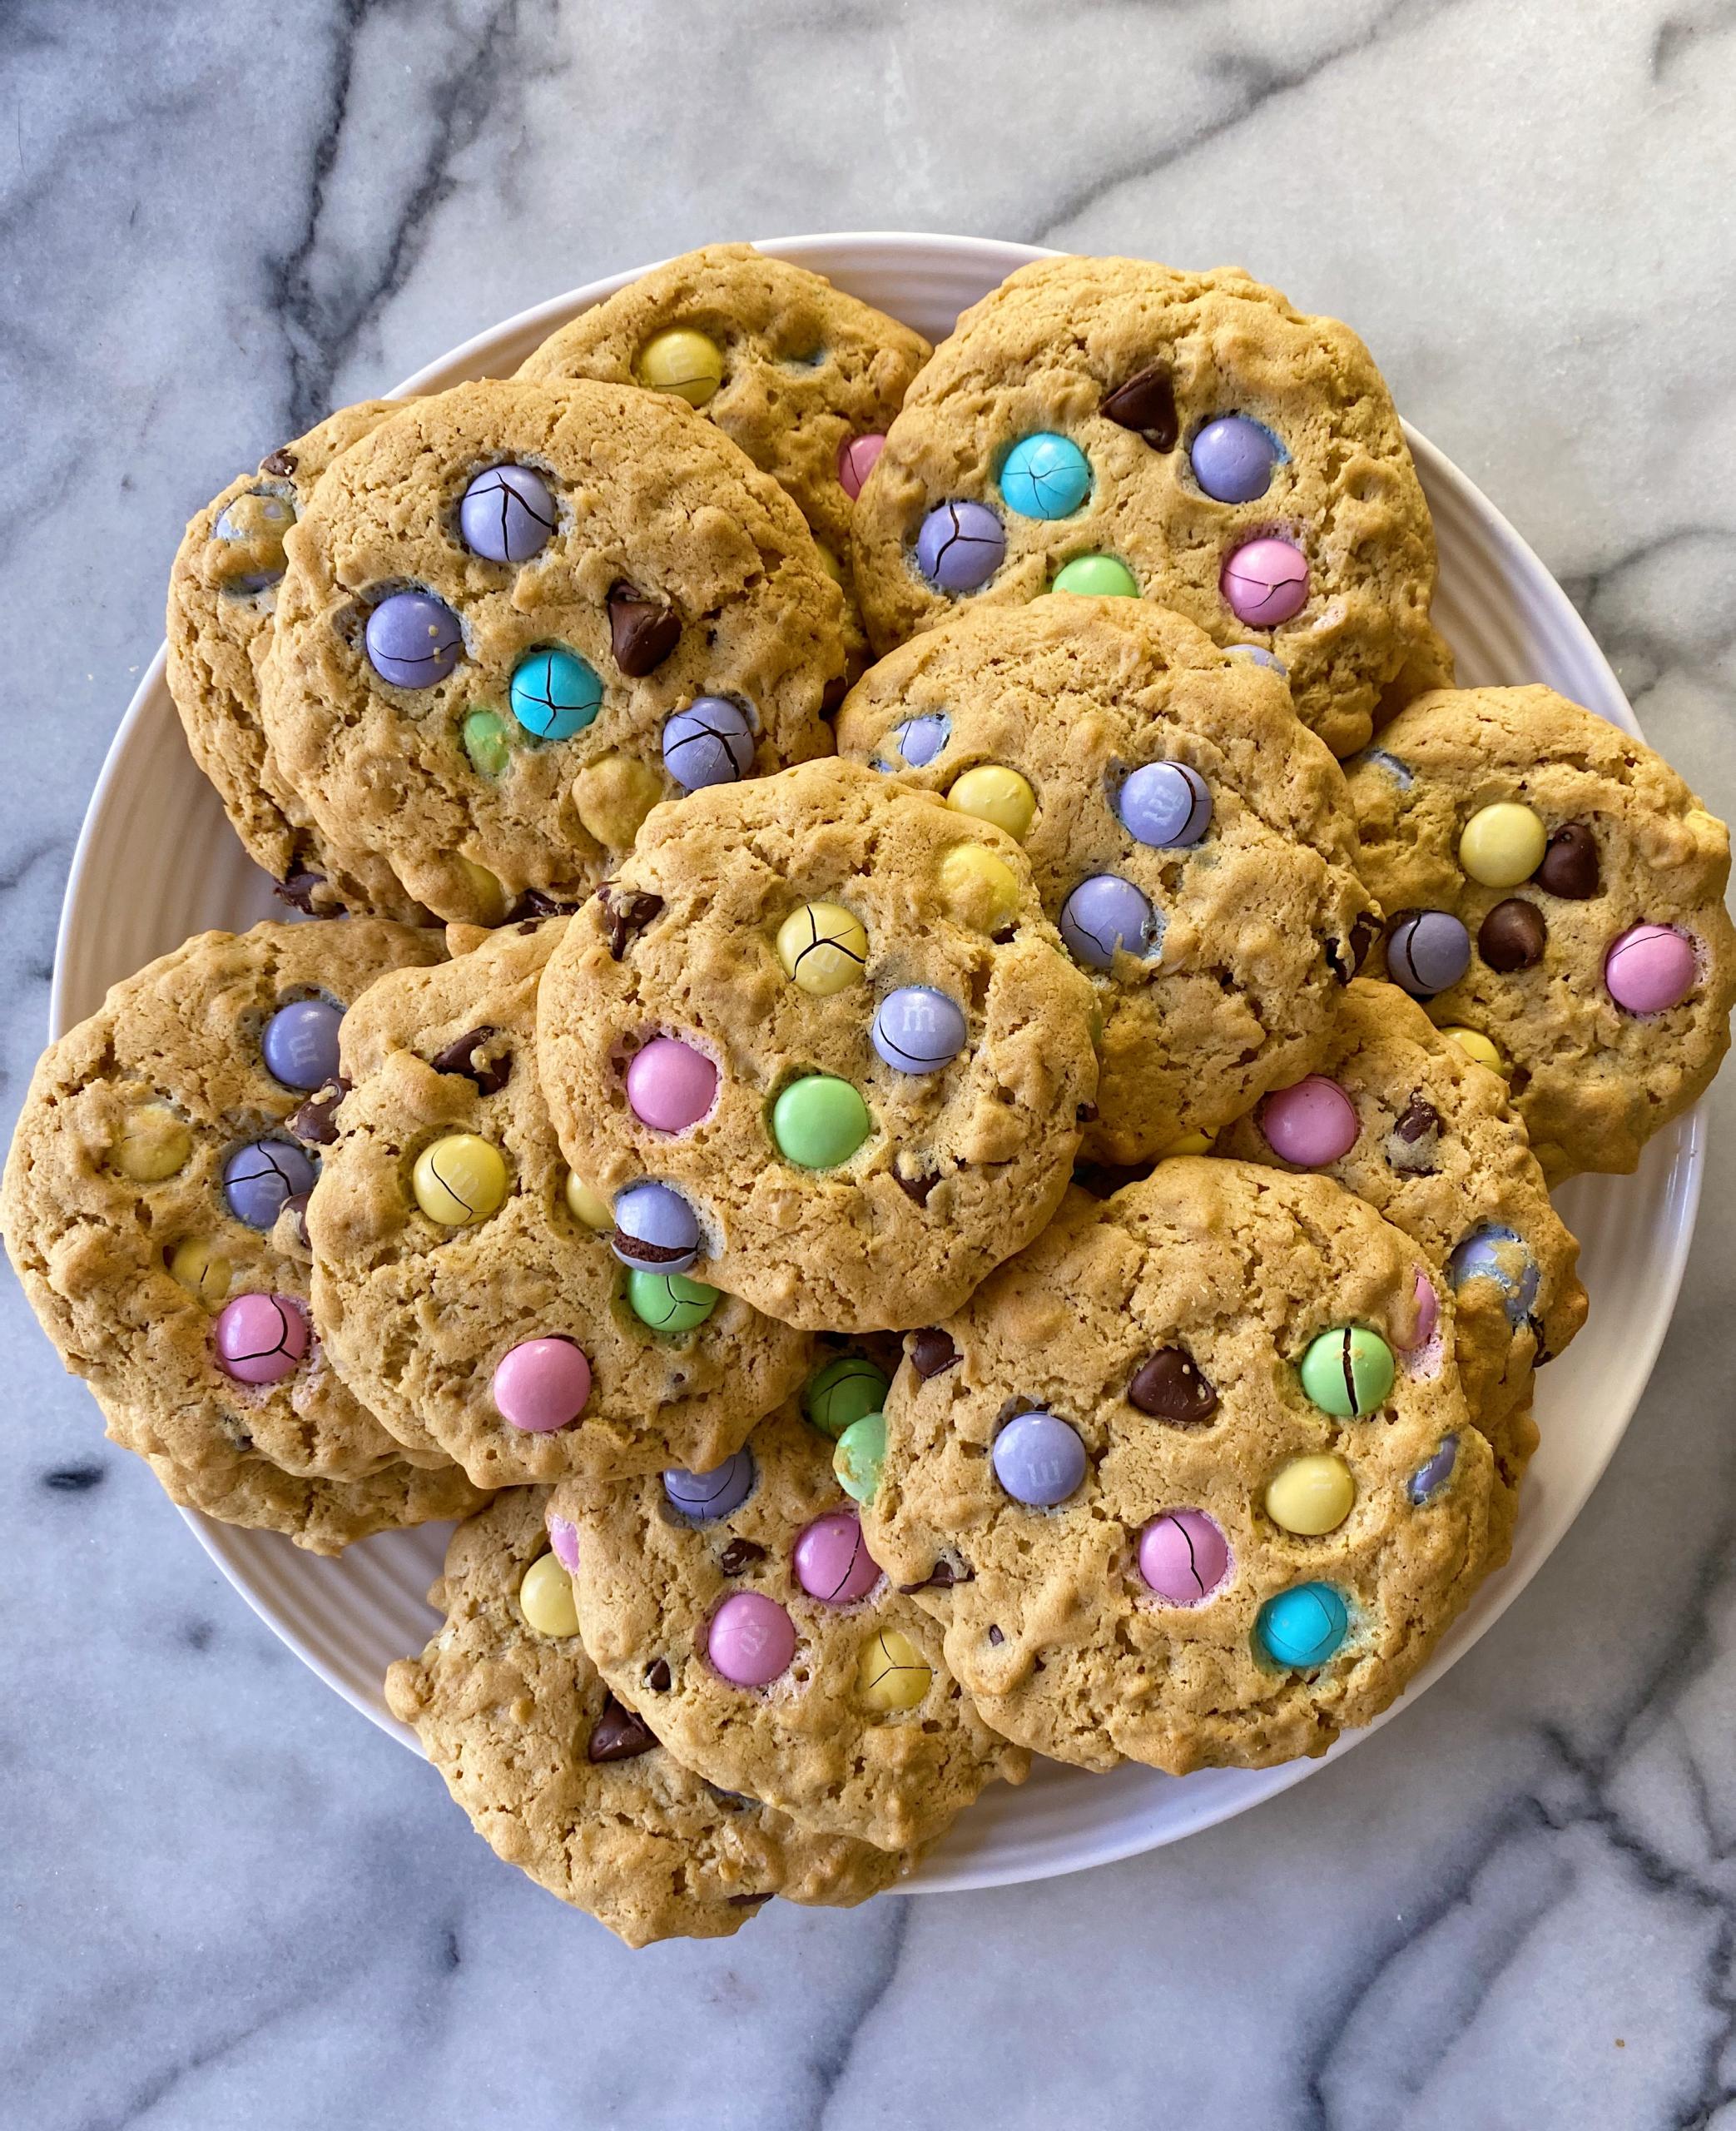 Easy gluten-free monster cookies www.healthygffamily.com